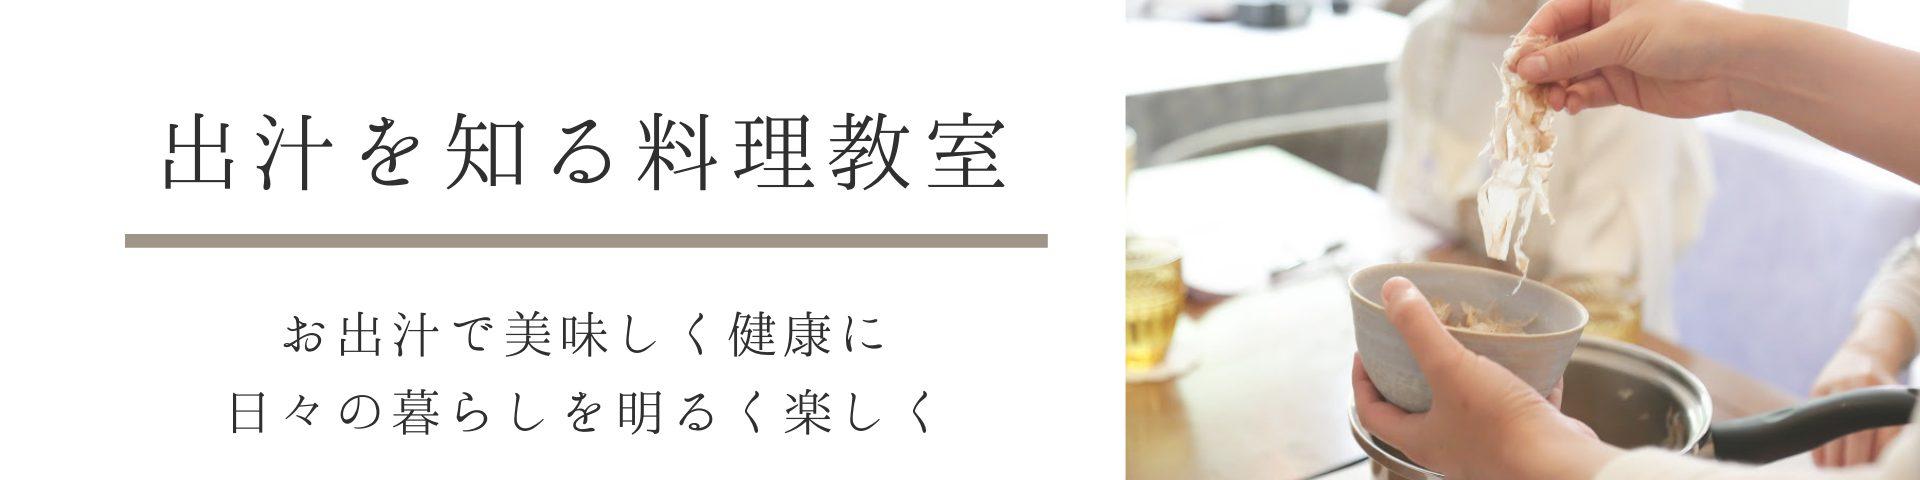 料理教室Laugh a Lot | 京都